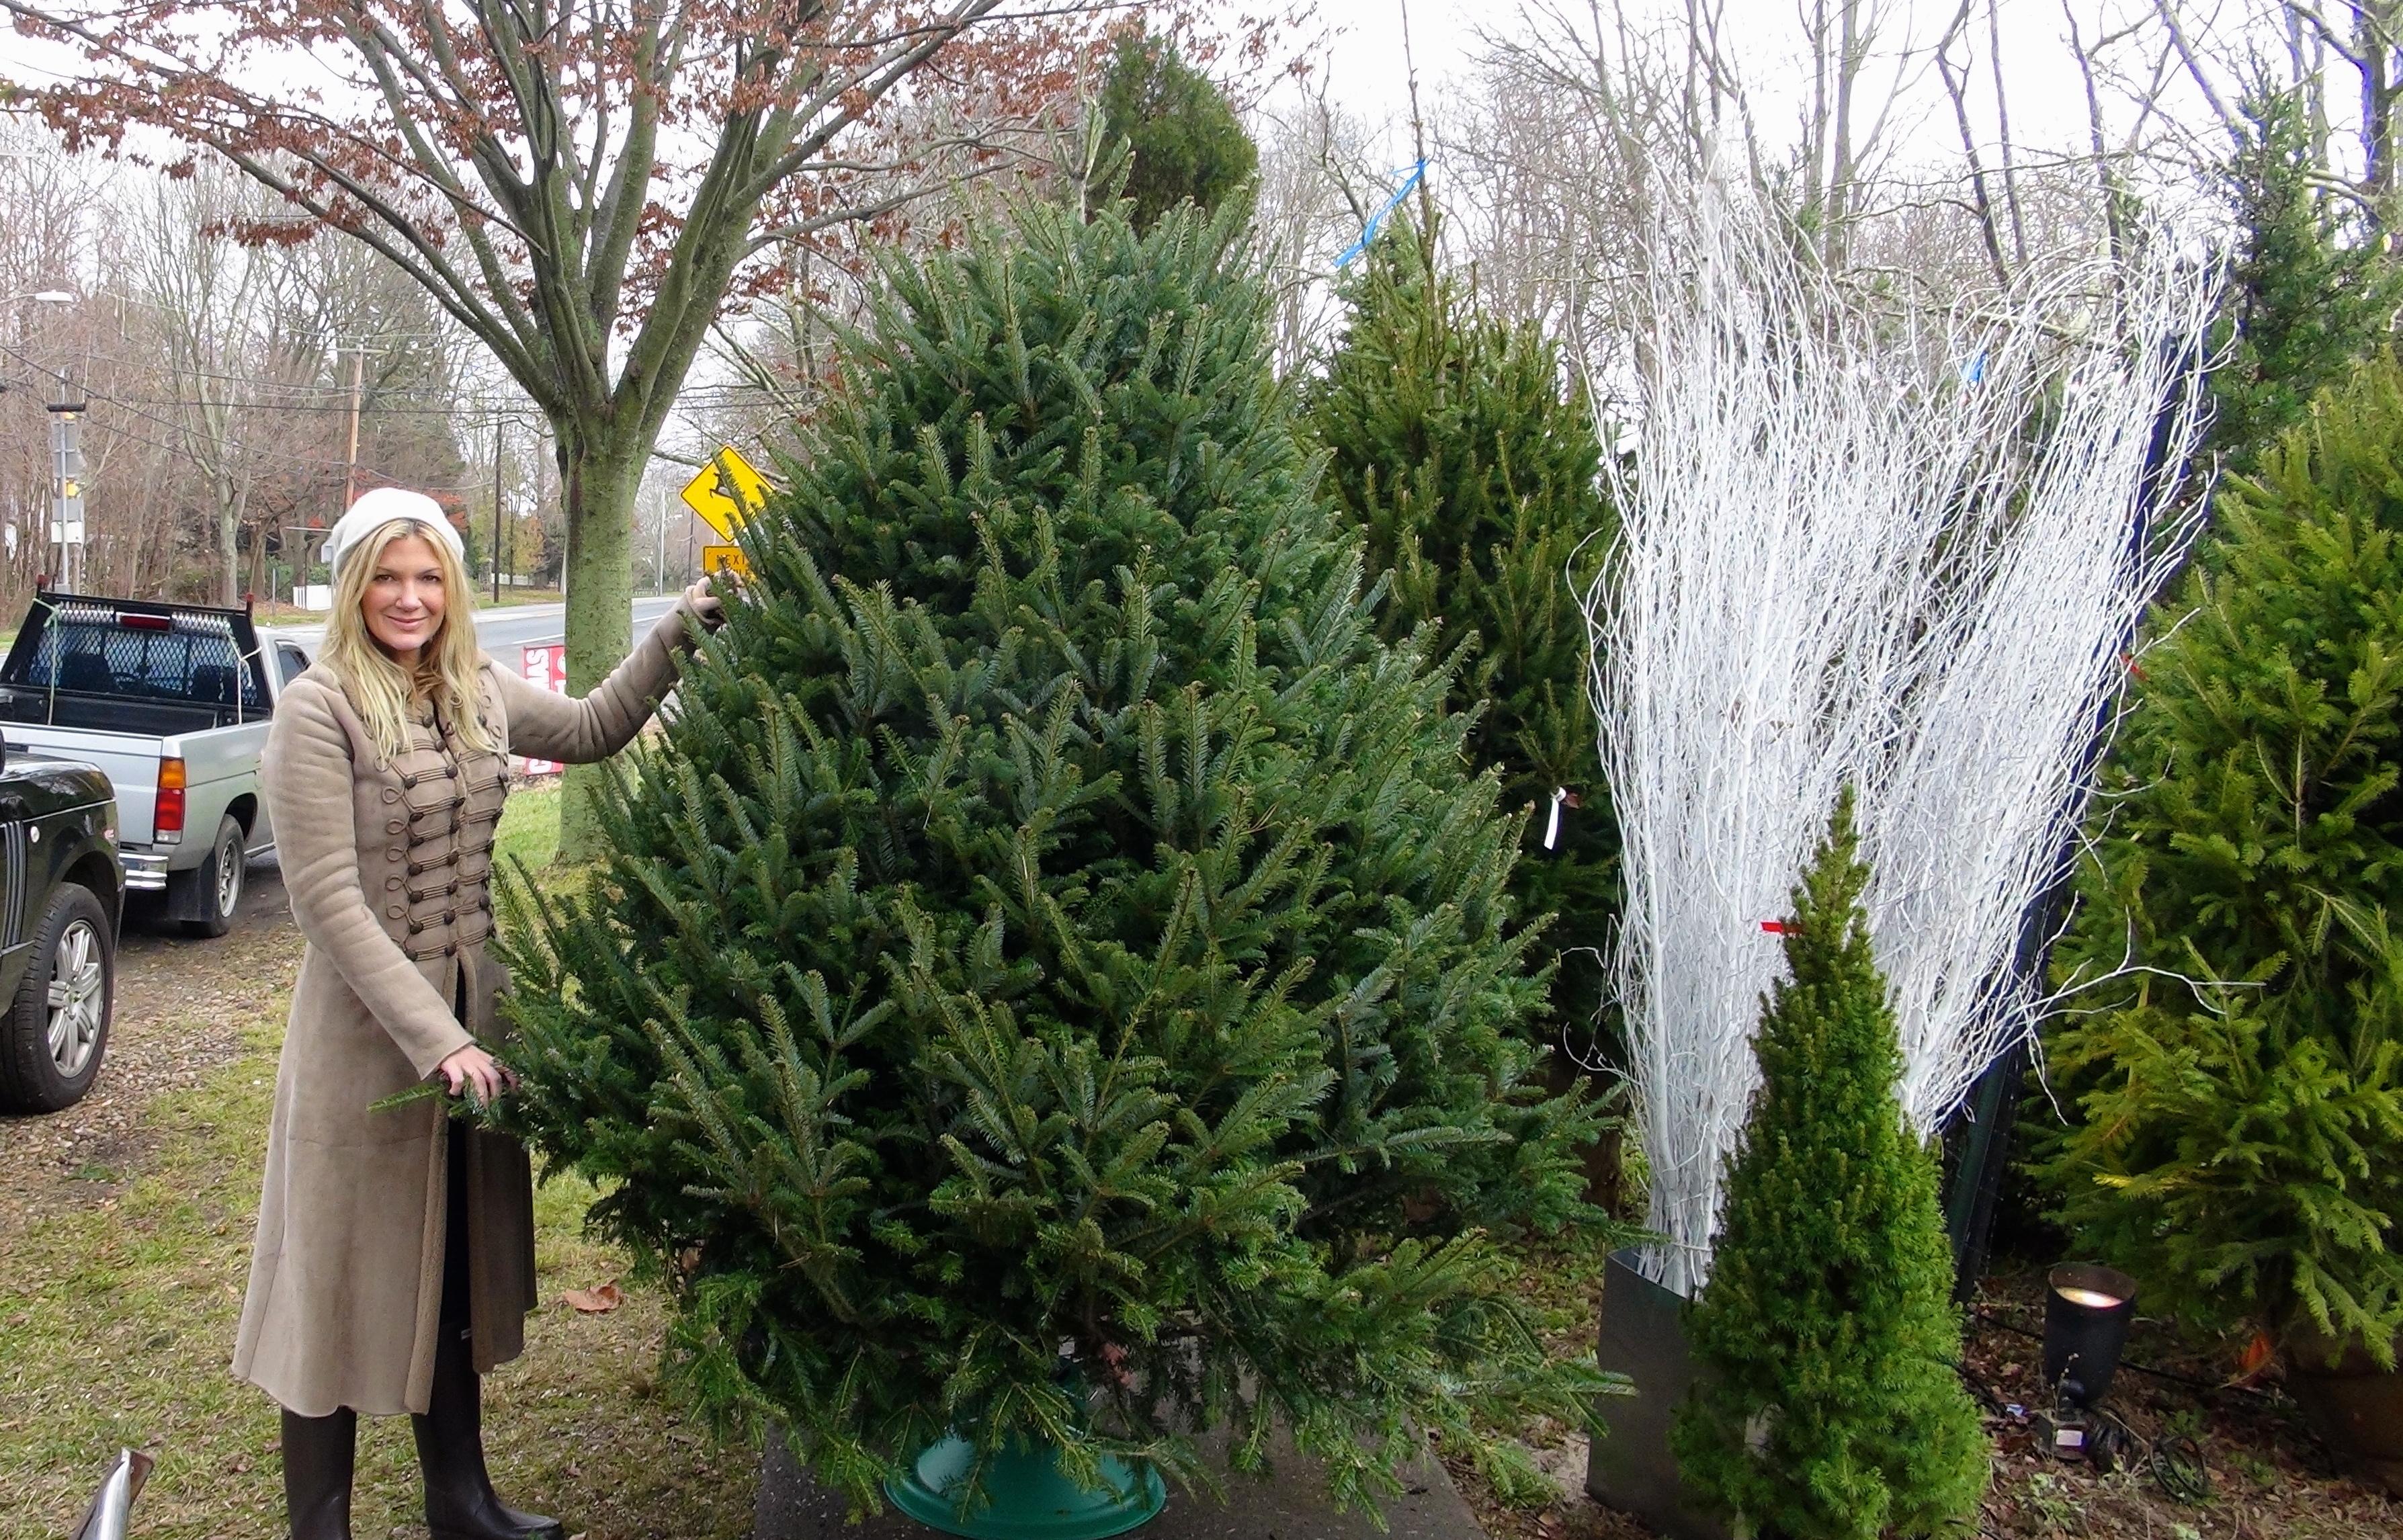 KDHamptons BEFORE & AFTER Christmas Tree Reveal! - KDHamptons